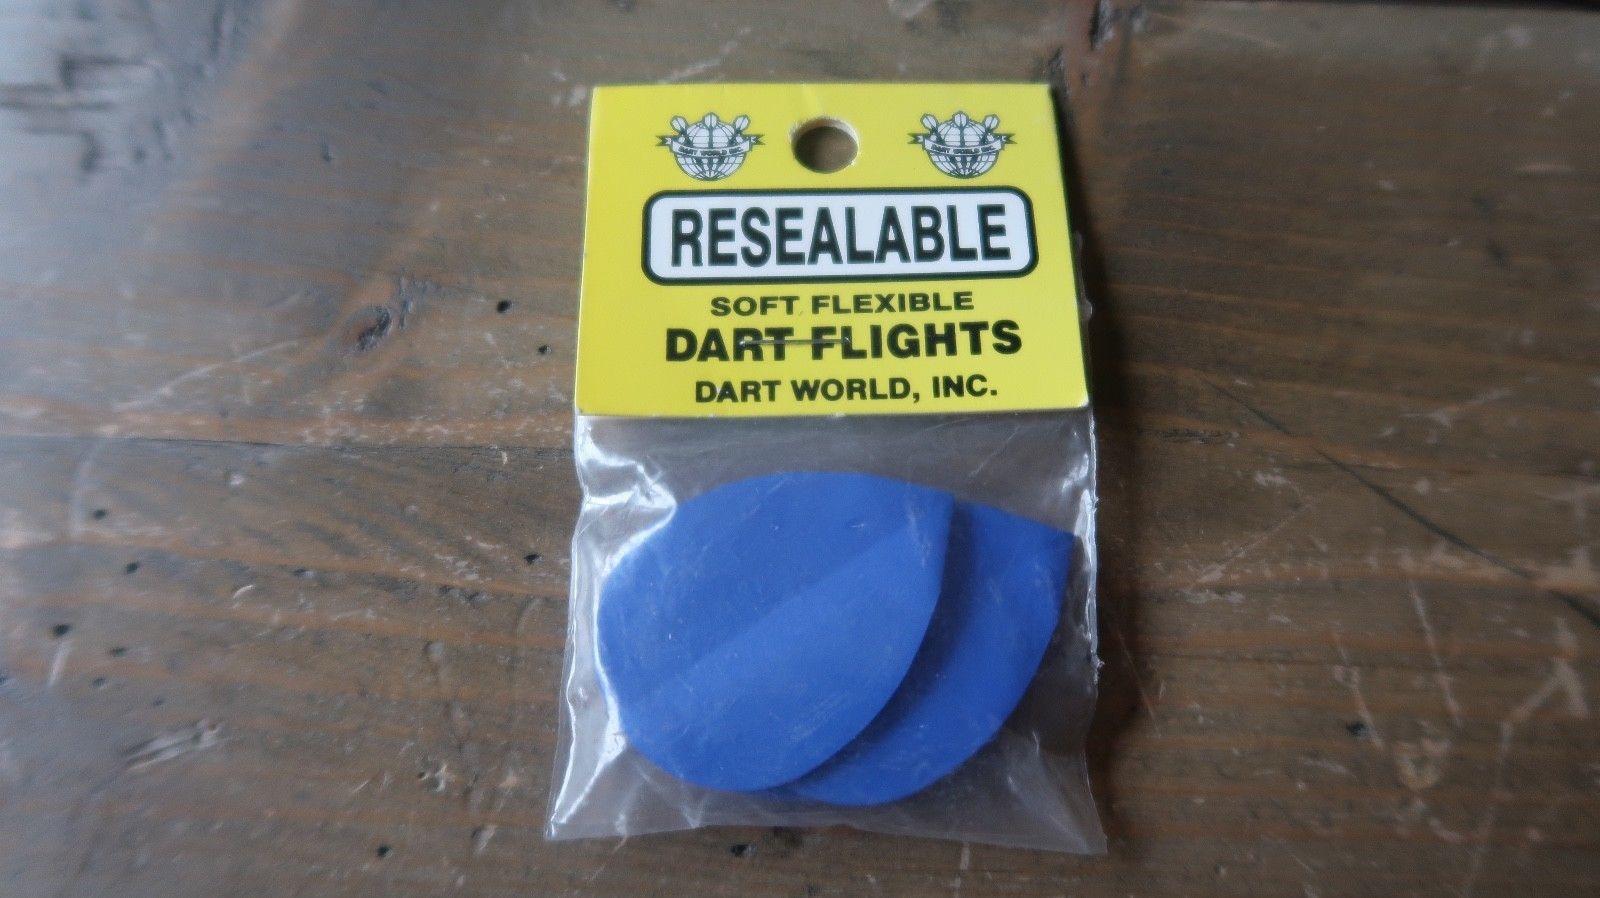 3 NEW Vintage Dart Flights Blue